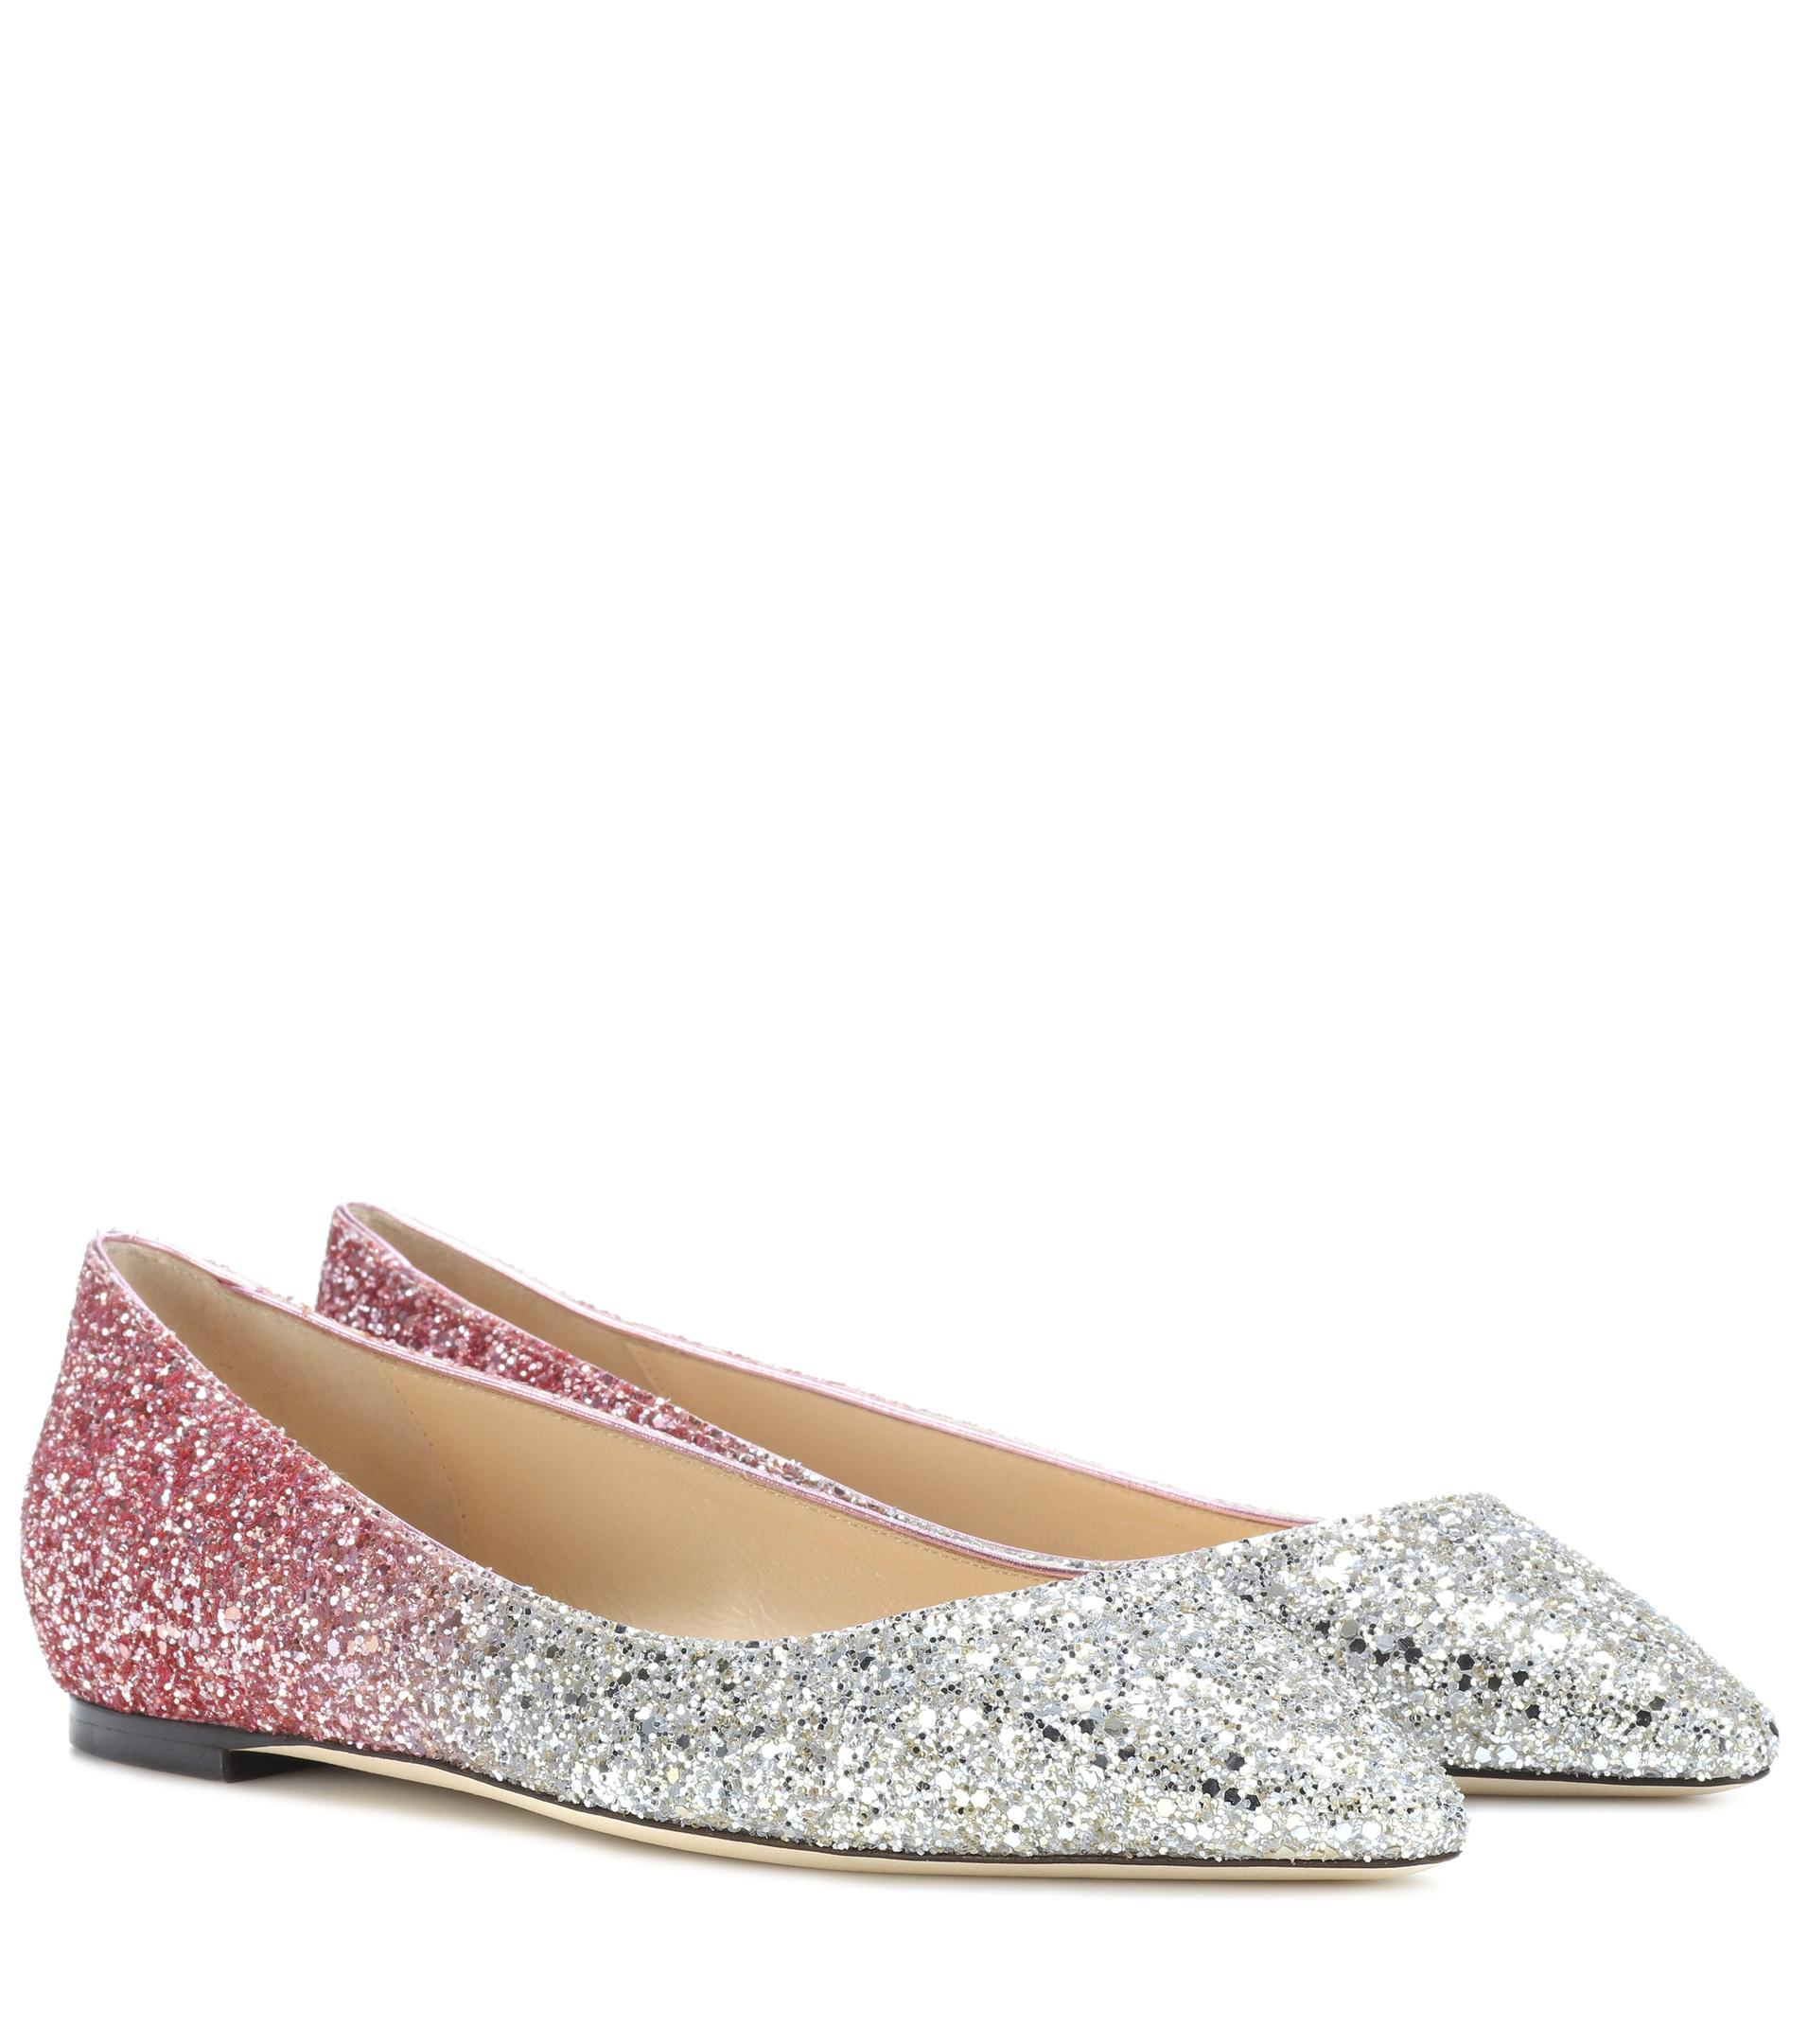 Jimmy choo Romy Flat glitter ballerinas hcNUNtdOah